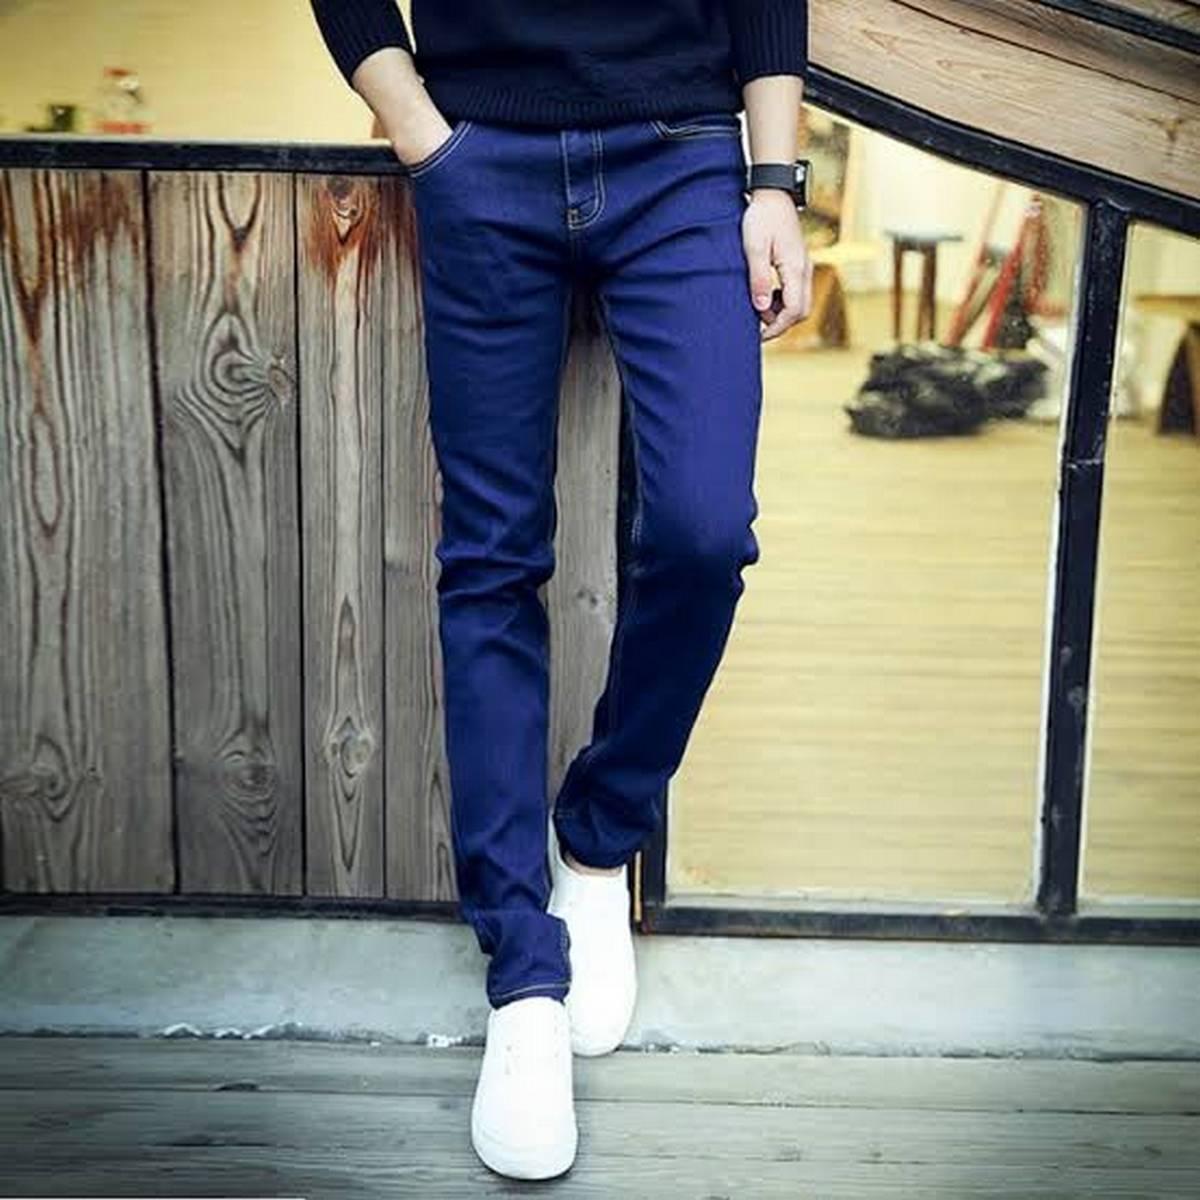 Blue Color Men Denim Jeans Pent Export Quality Stretchable jeans for men High Quality